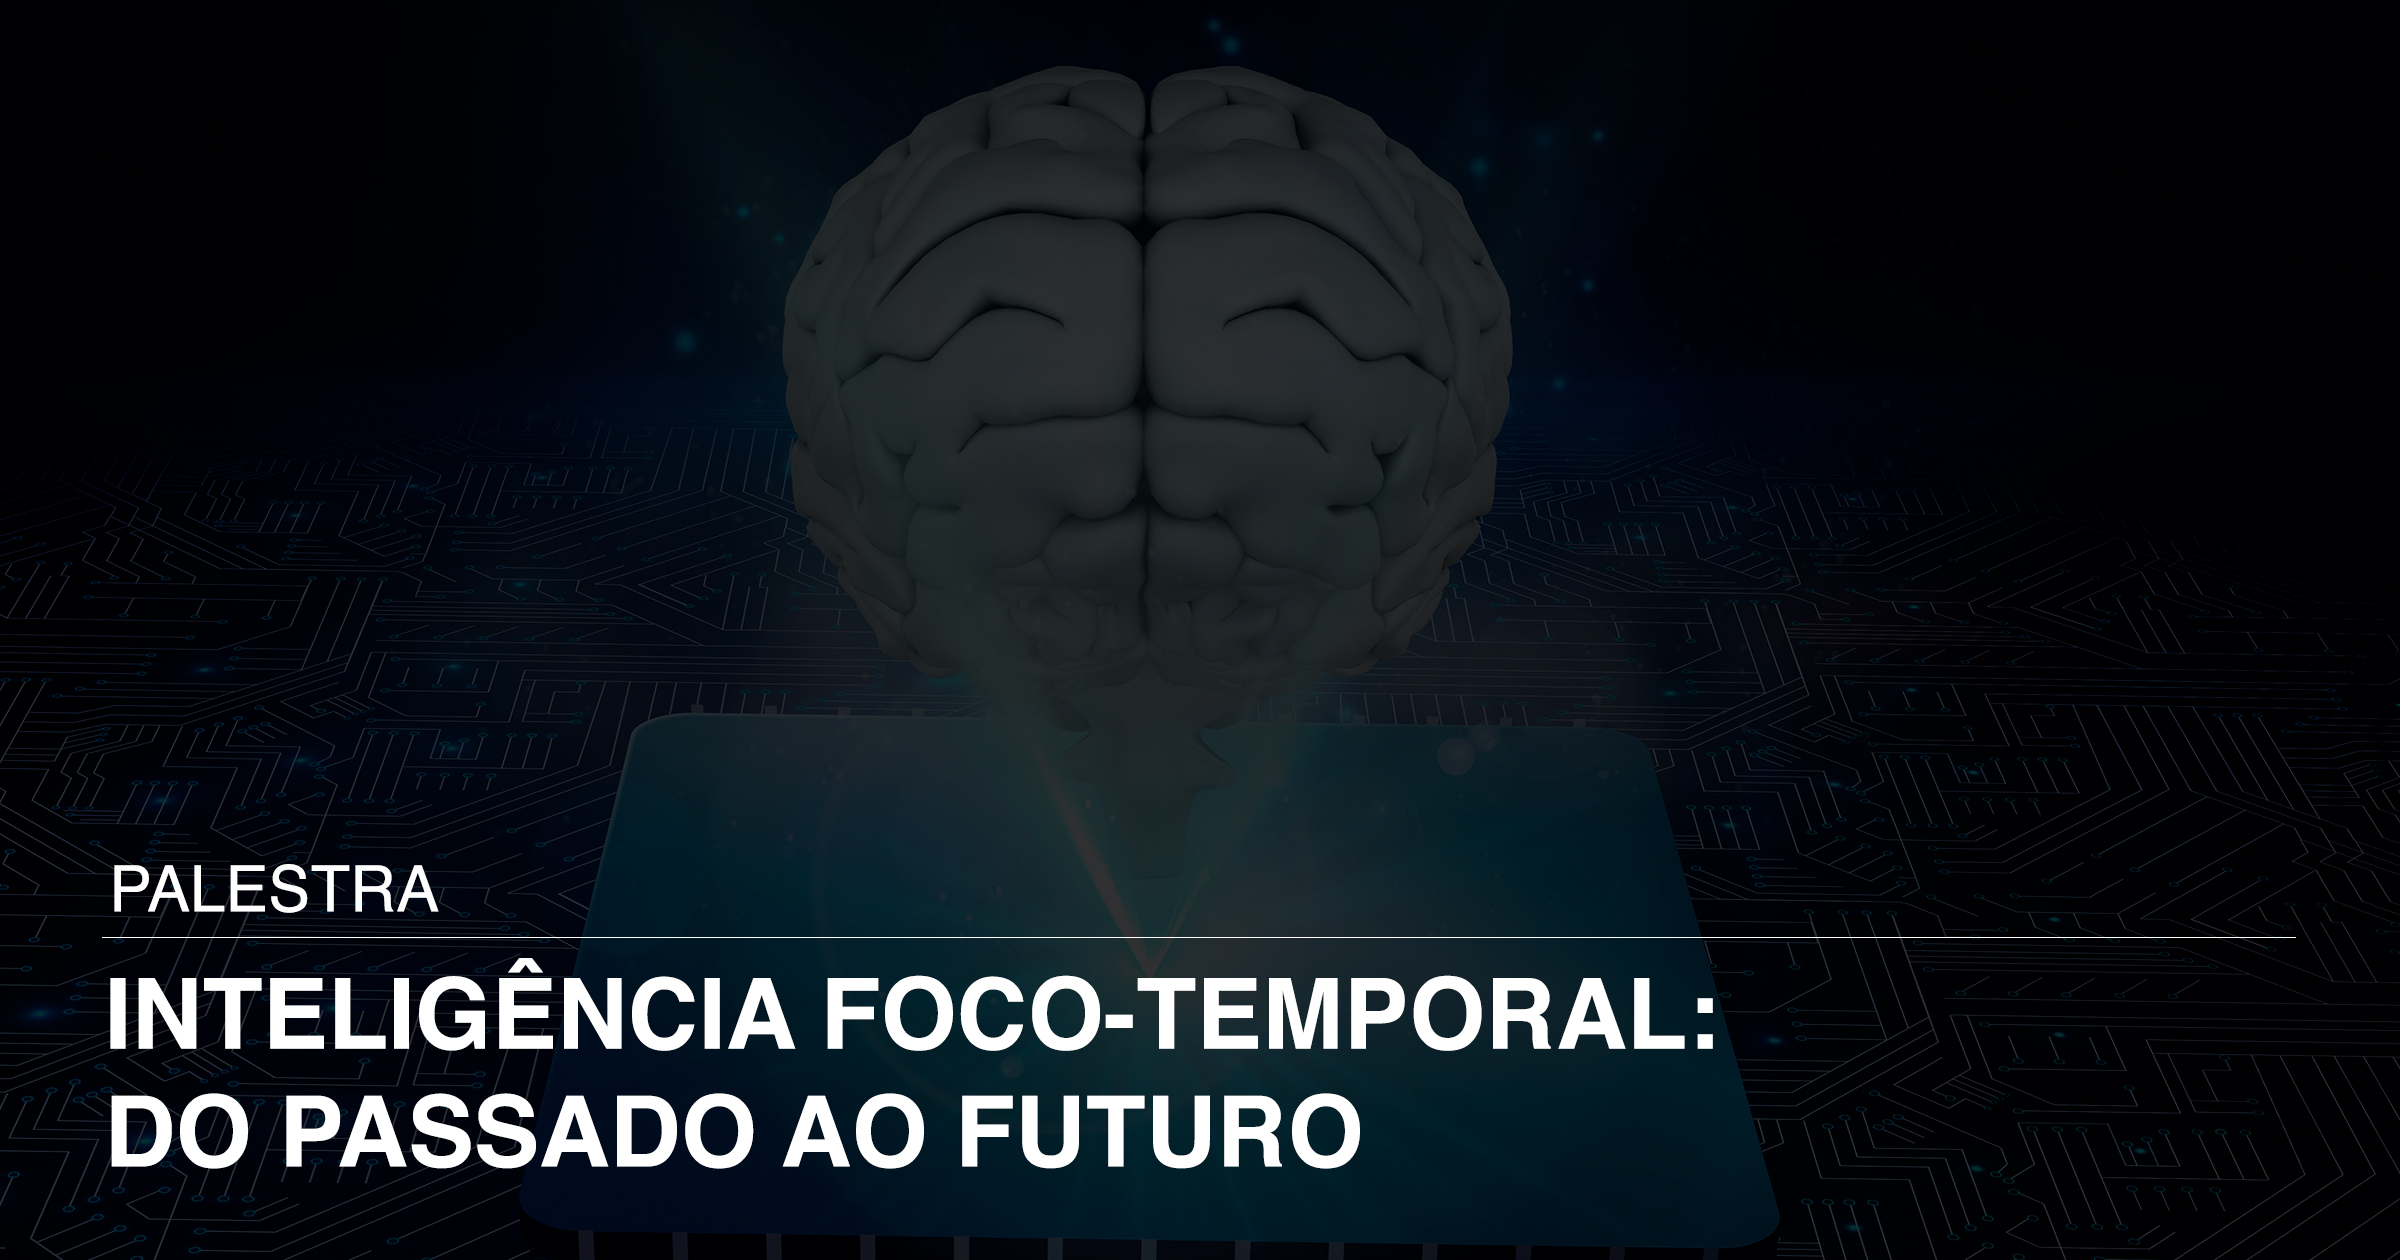 Palestra - Inteligência Foco-Temporal: Do Passado ao Futuro